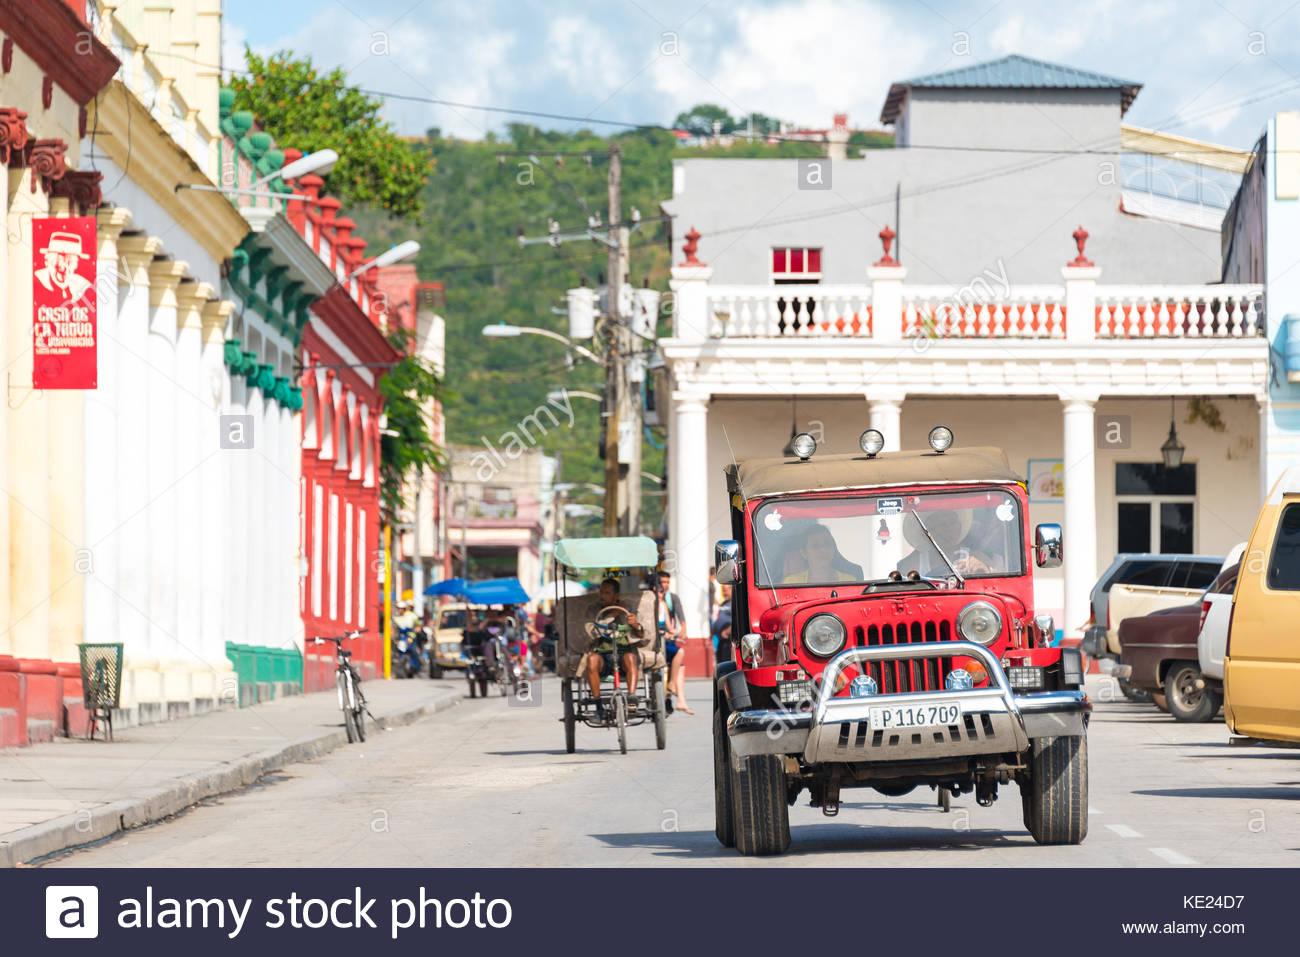 Holguin Cuba Cars Stock Photos & Holguin Cuba Cars Stock Images - Alamy